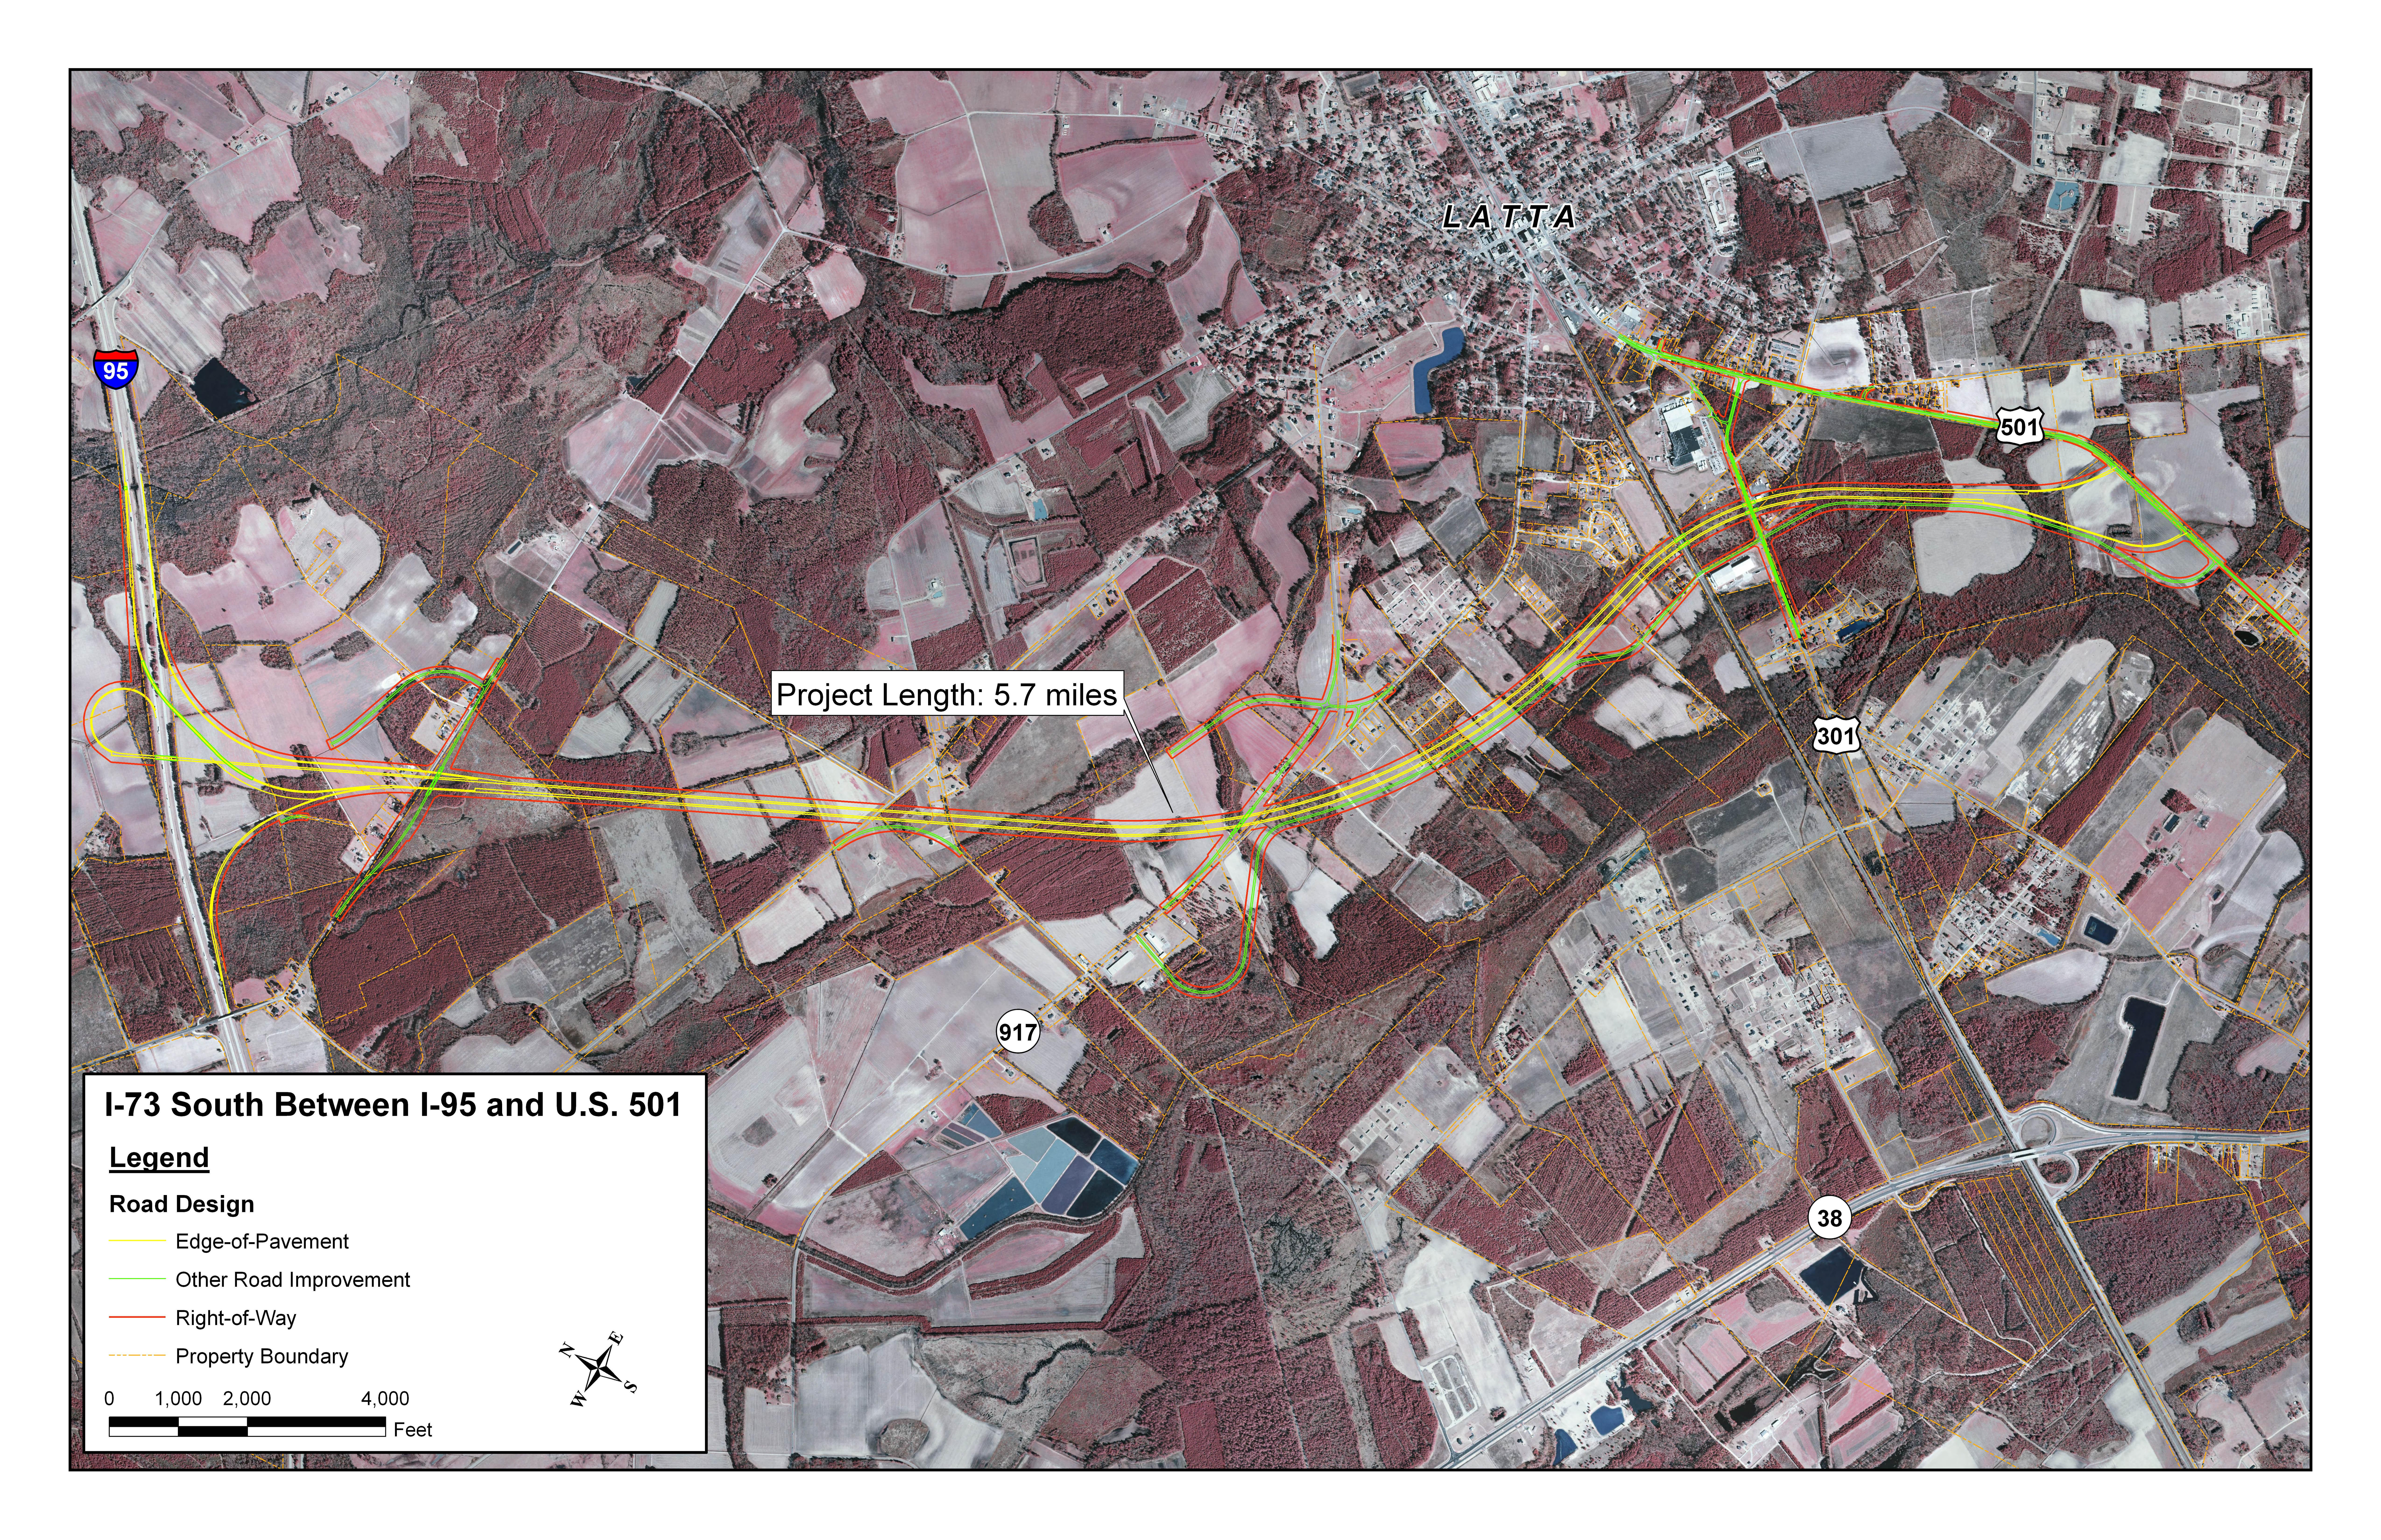 I Environmental Impact Study - East coast us rt 95 map